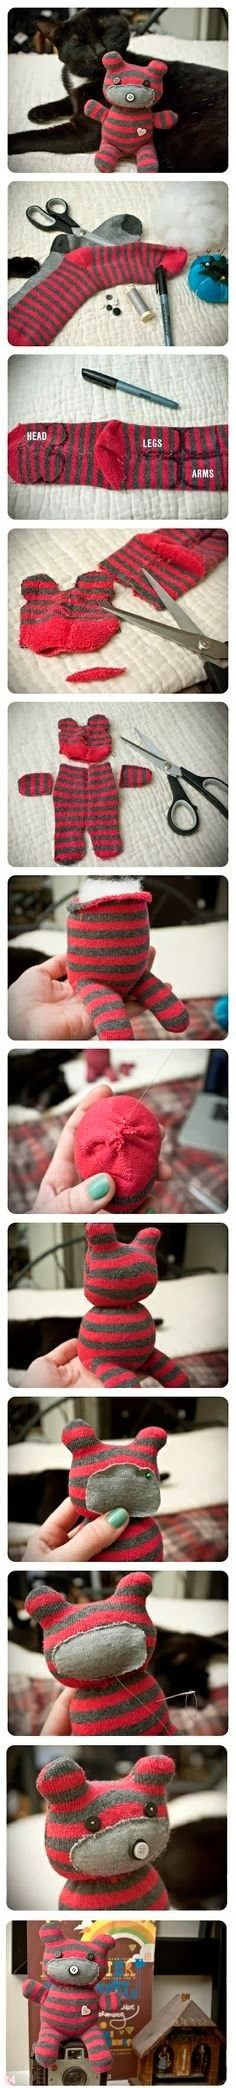 DIY Handmade & Craft Ideas 2014